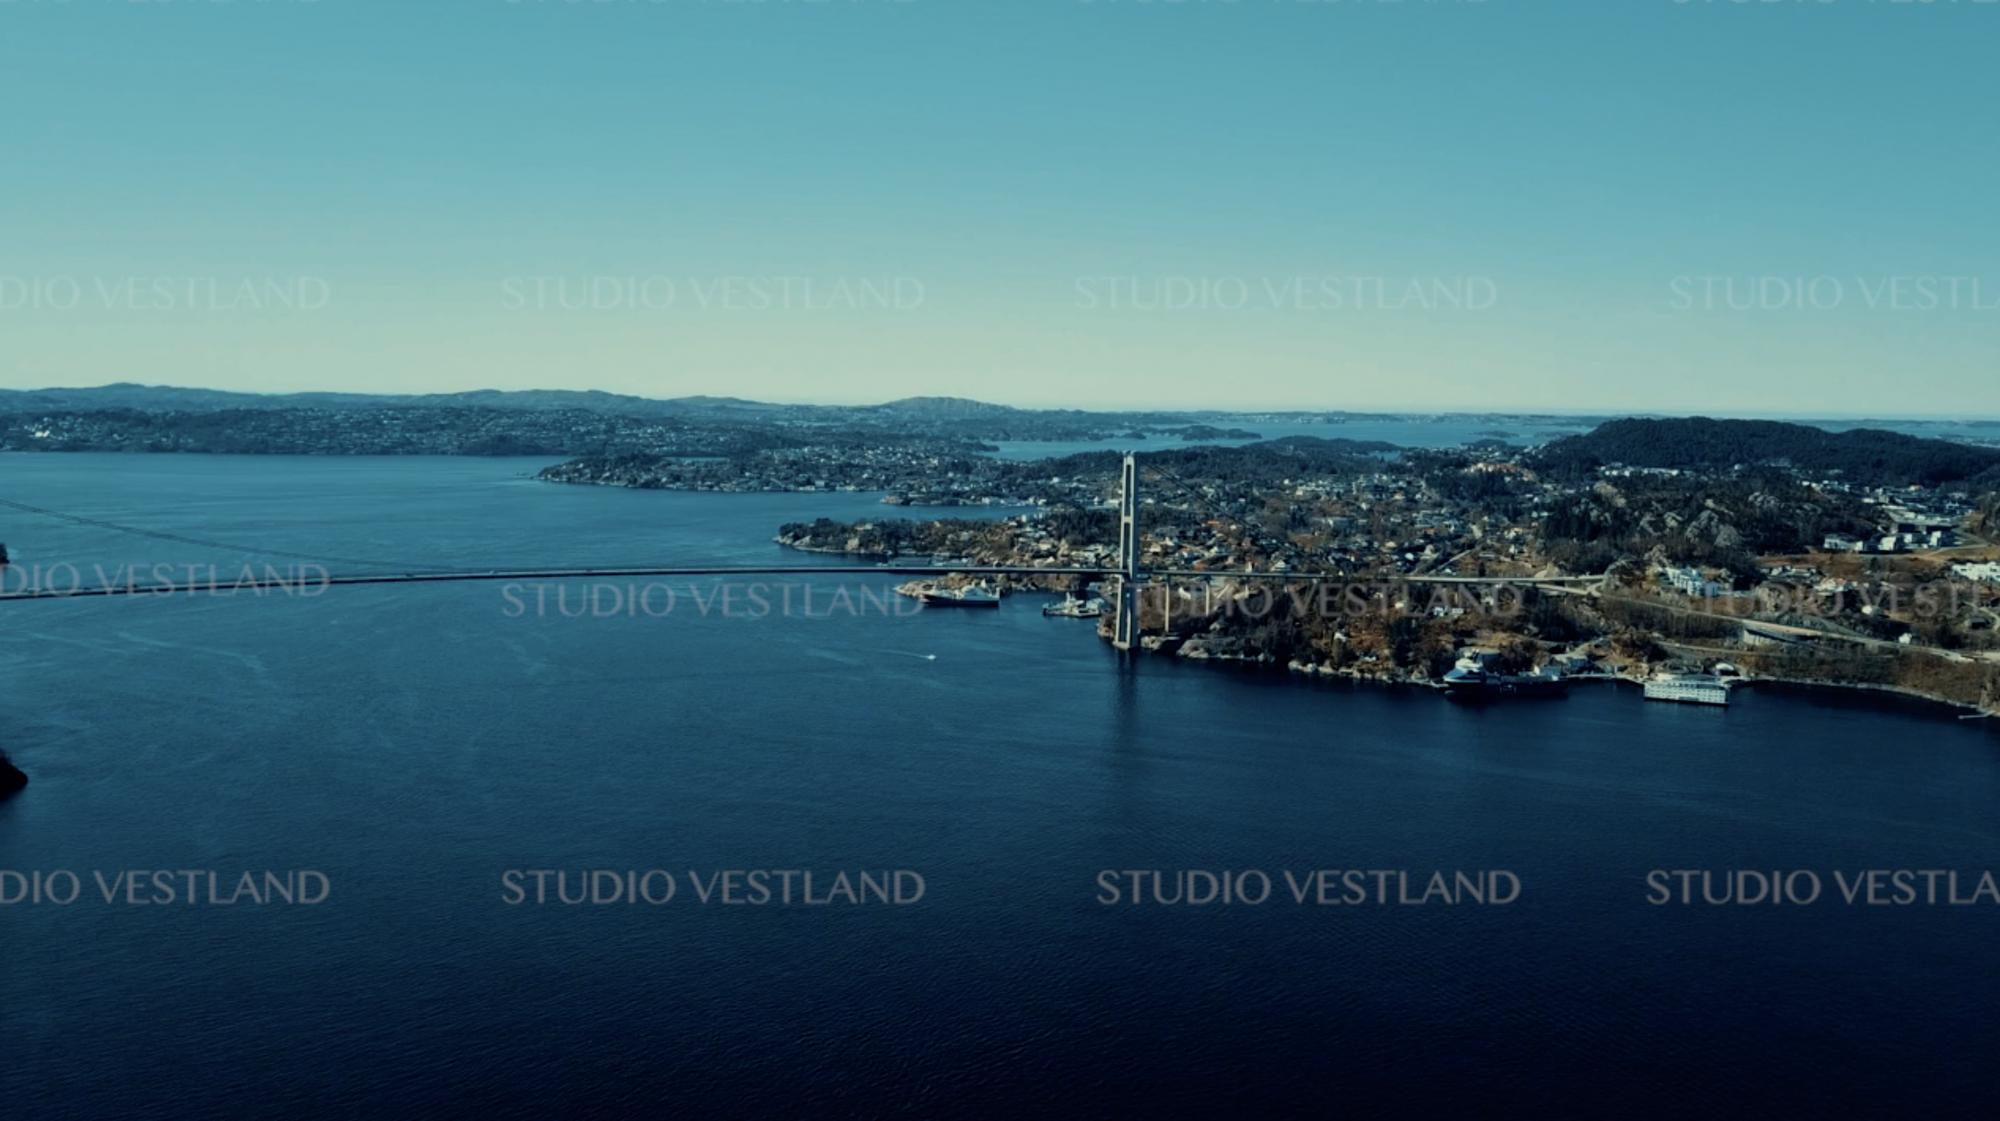 Studio Vestland - Askøy V02